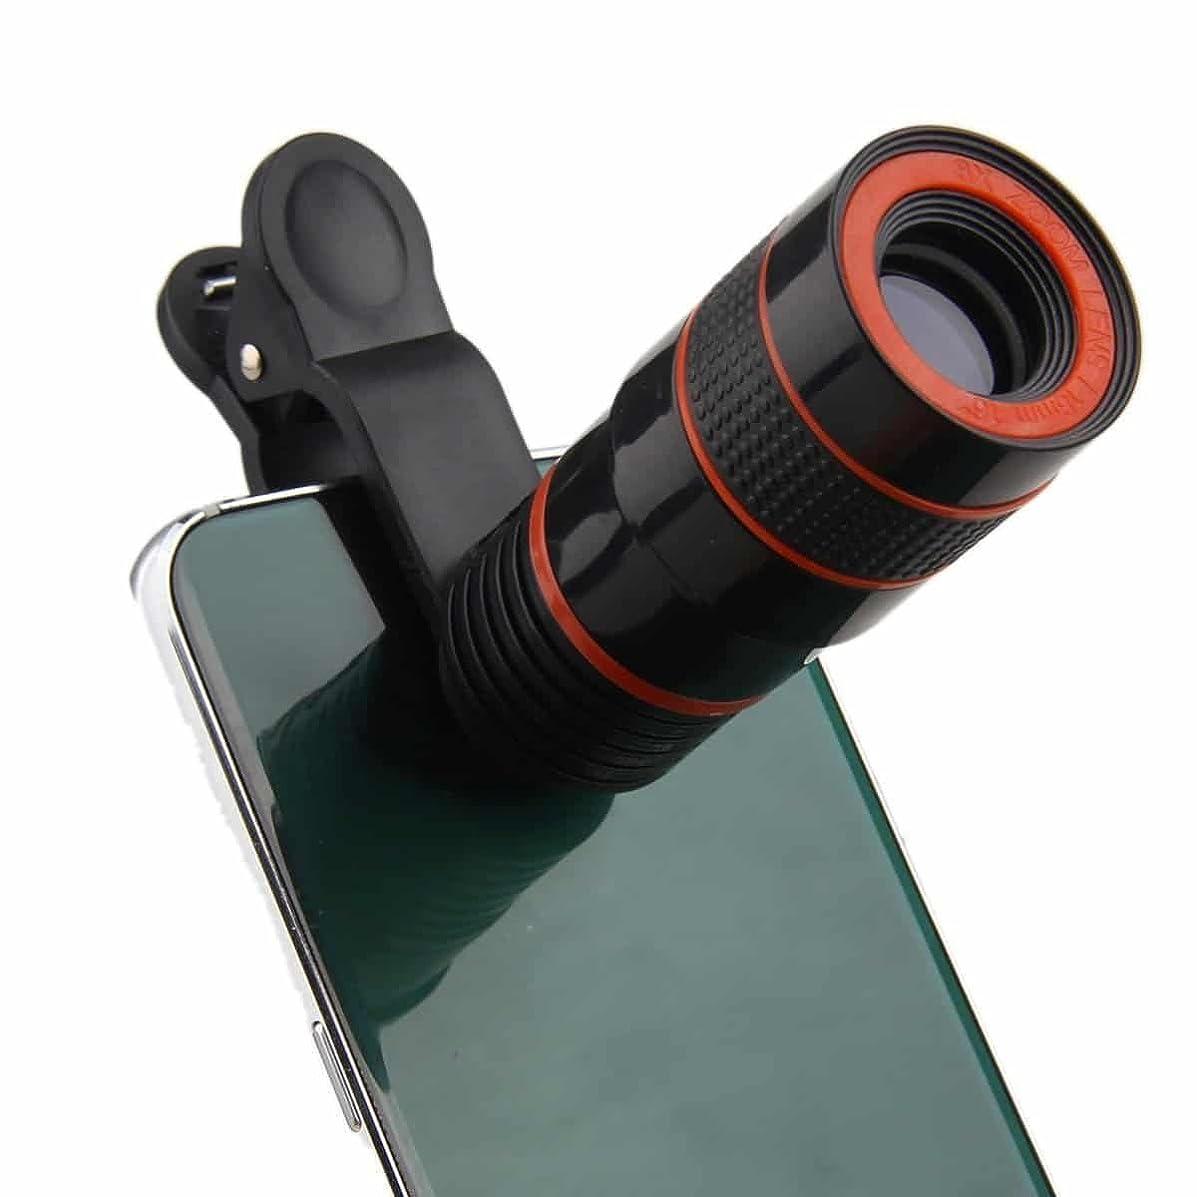 I-Sonite (Black 8X Zoom) Universal Optical Magnifier Telescope Phone Camera Lens Kit, Manual Focus For Also Fit For LG V30+